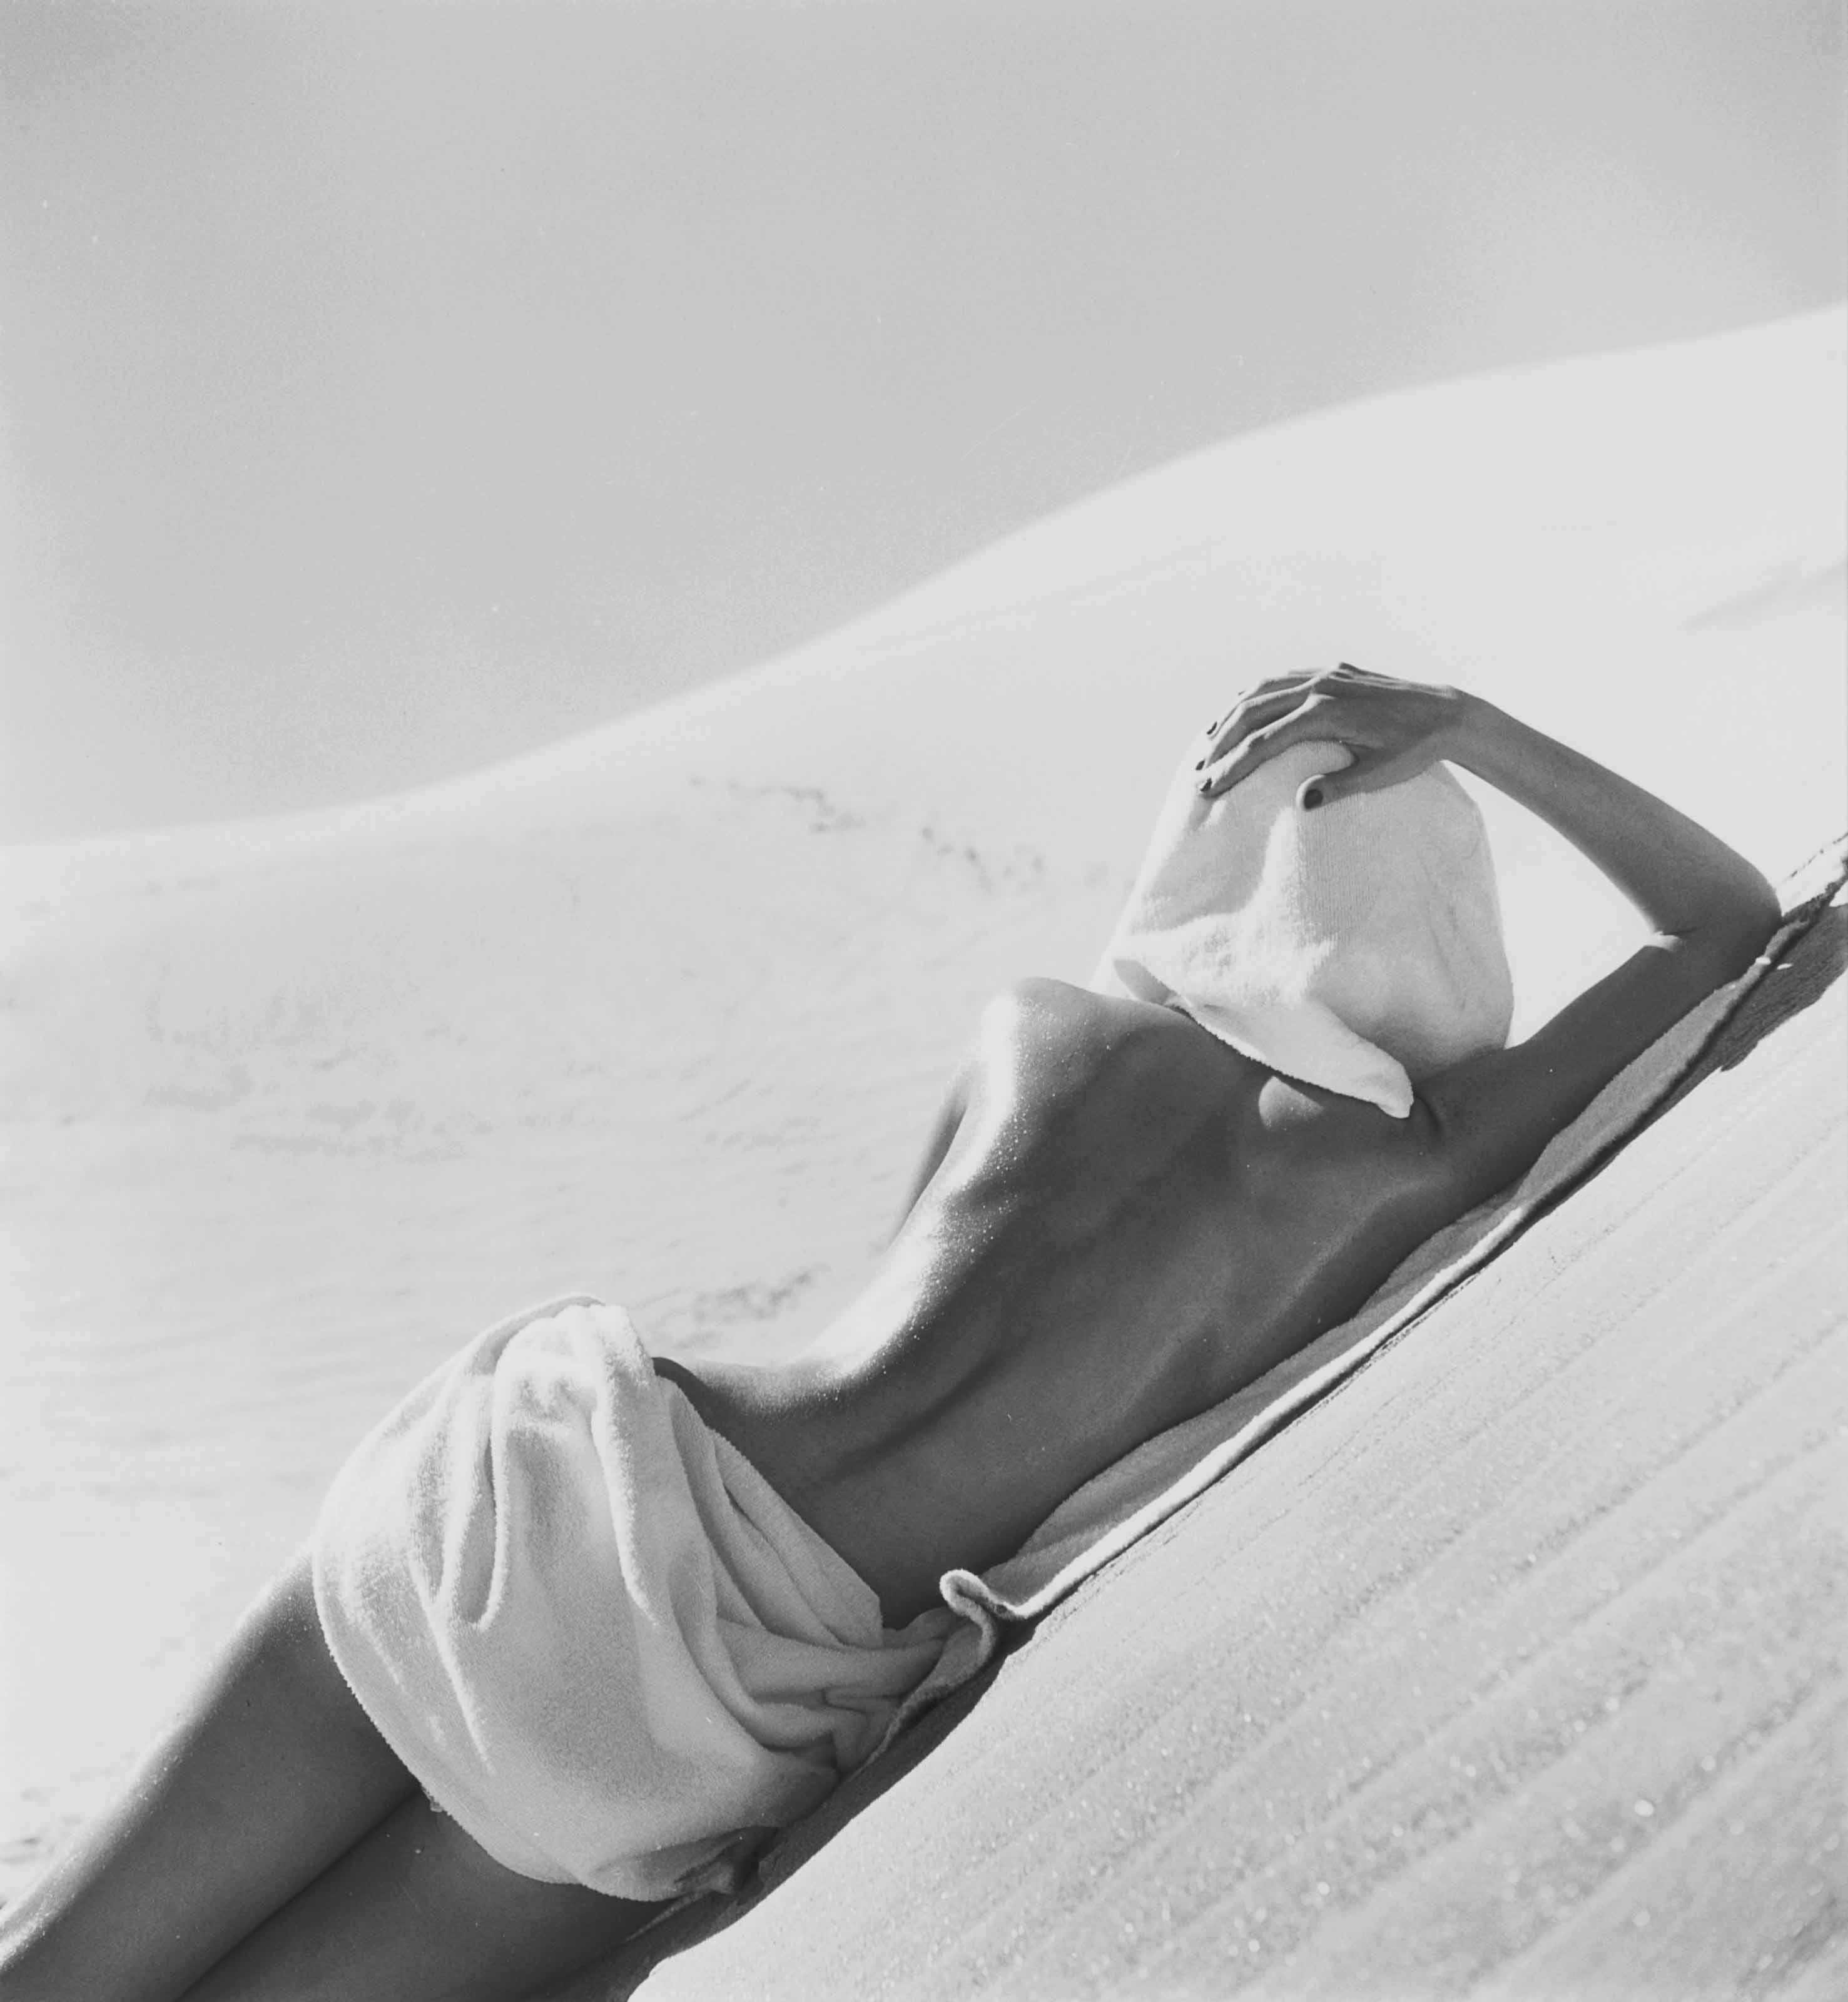 Nude on beach, California, 1948